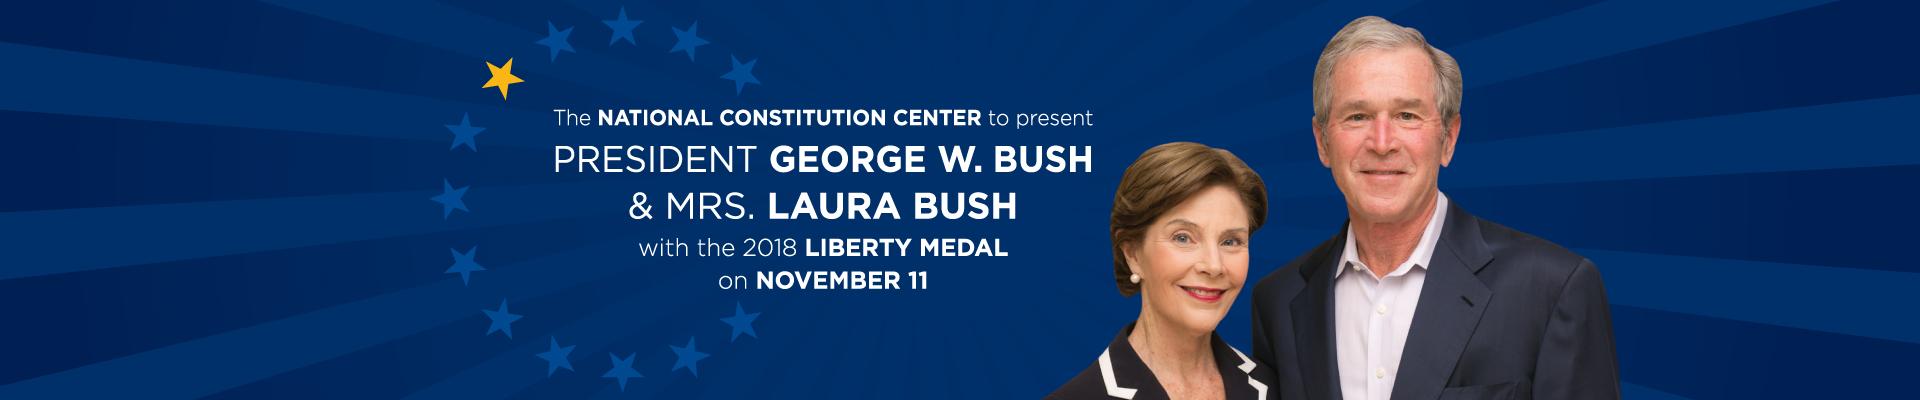 2018 Liberty Medal